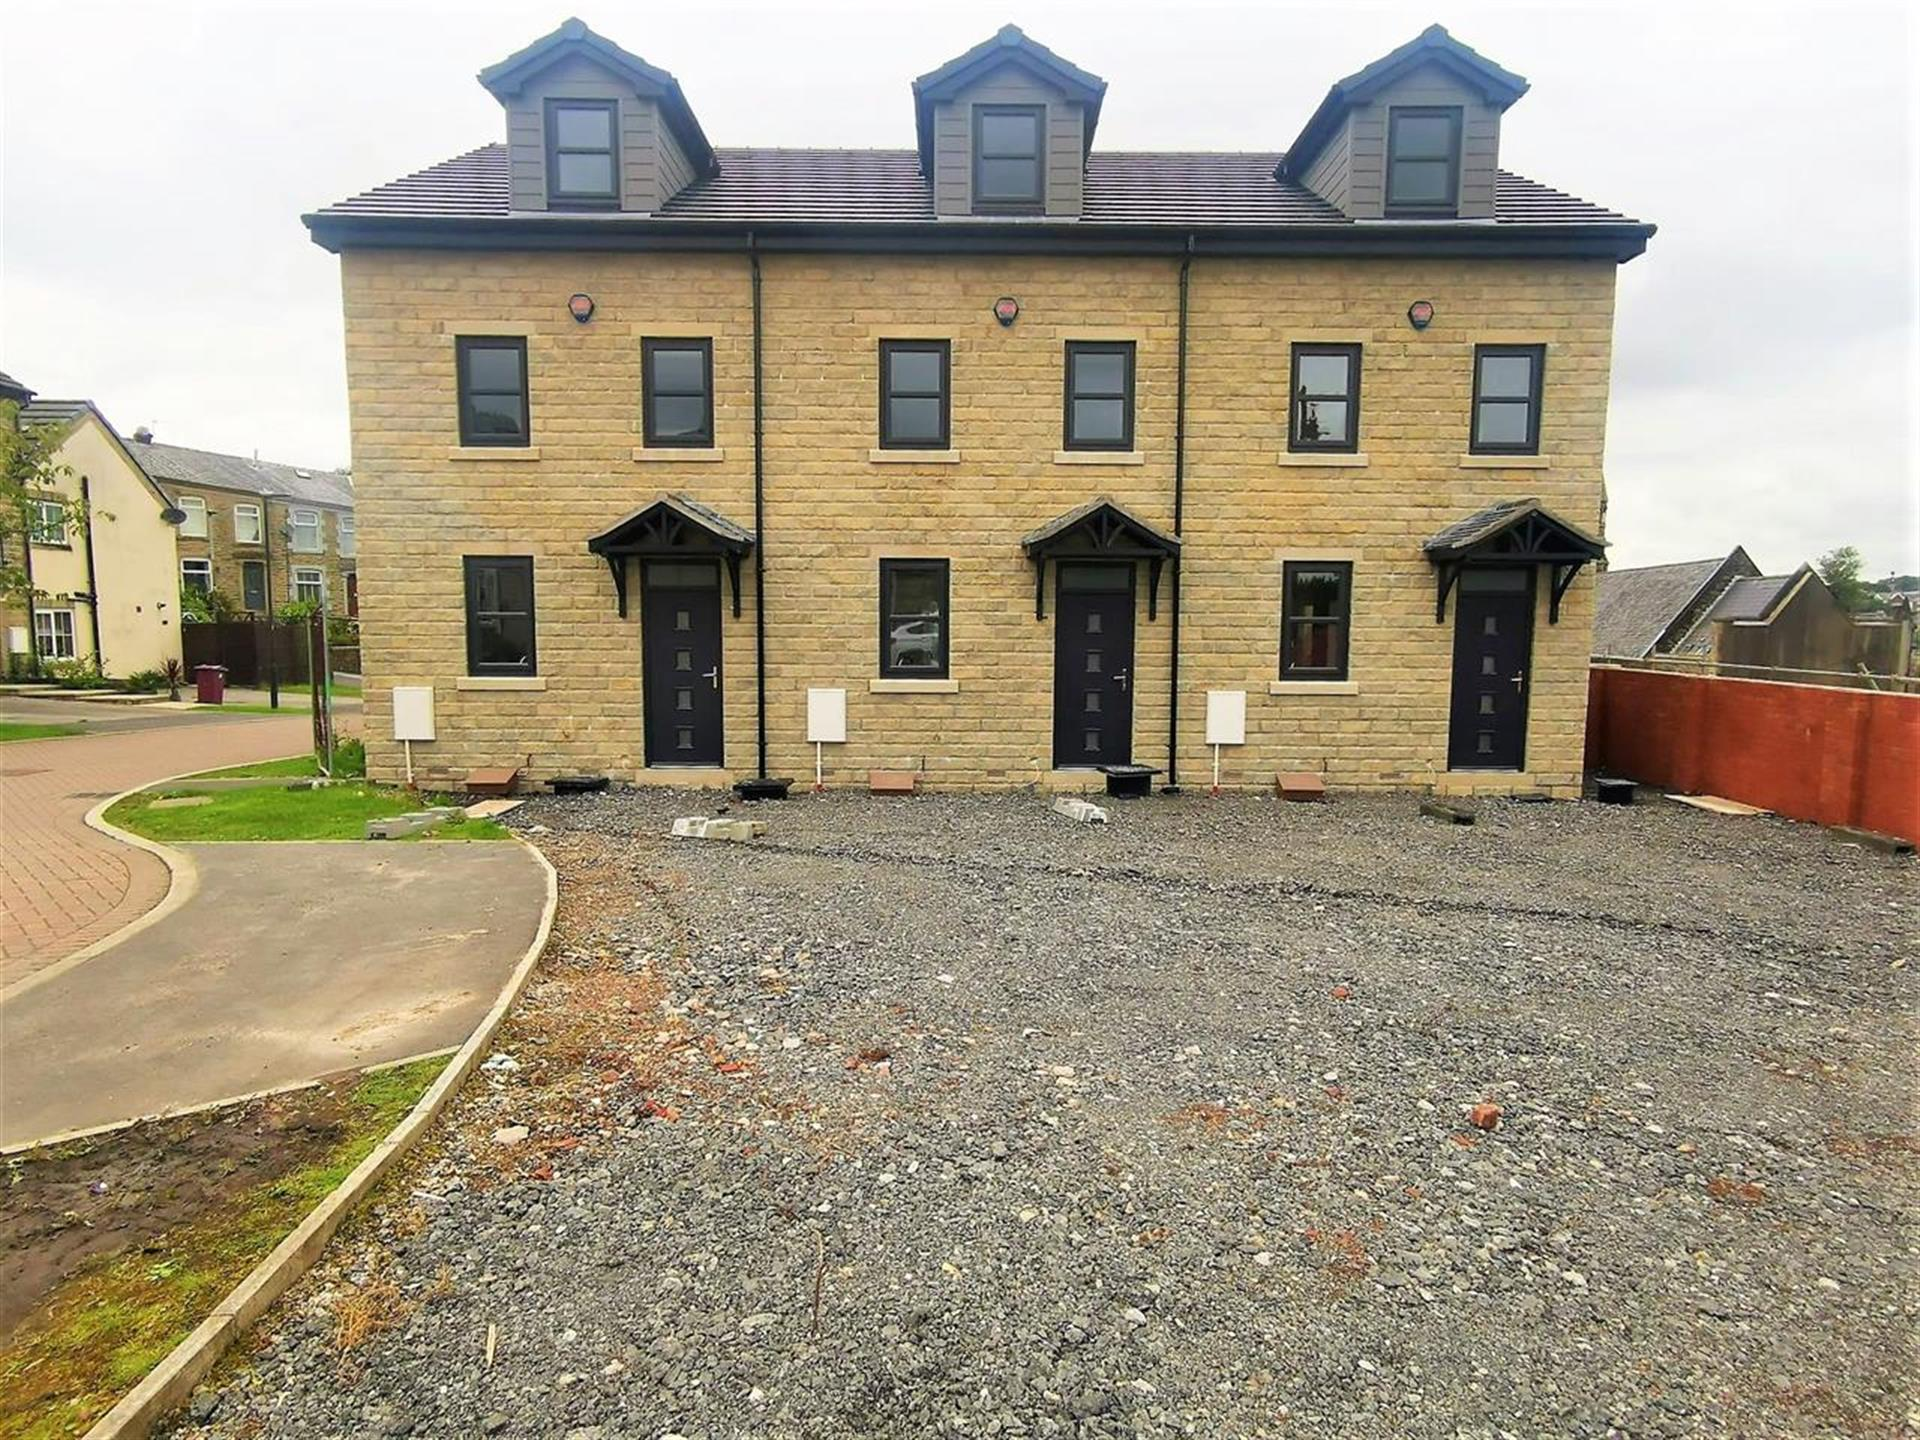 3 Bedroom House For Sale - External